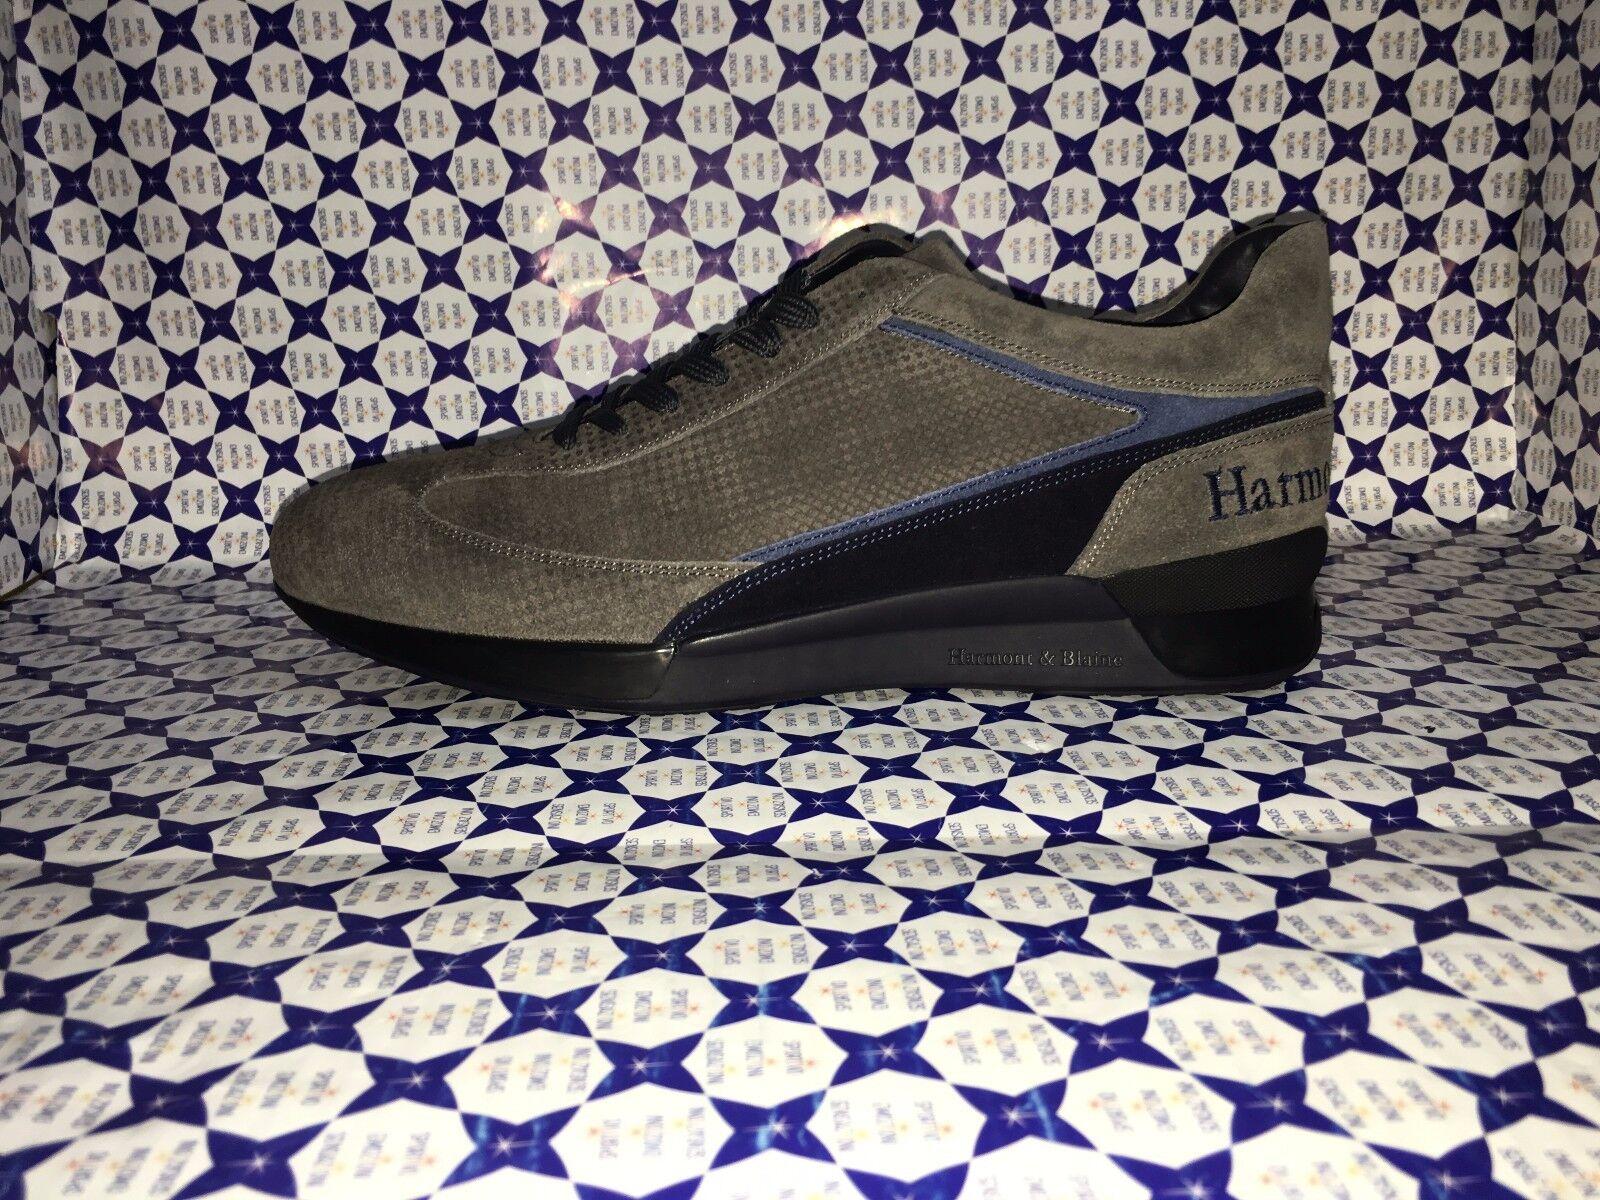 Scarpe HARMONT & BLAINE Uomo - Scarpe da Ginnastica Camoscio E9063 Piedipull - Tortora - E9063 Camoscio 2d561e